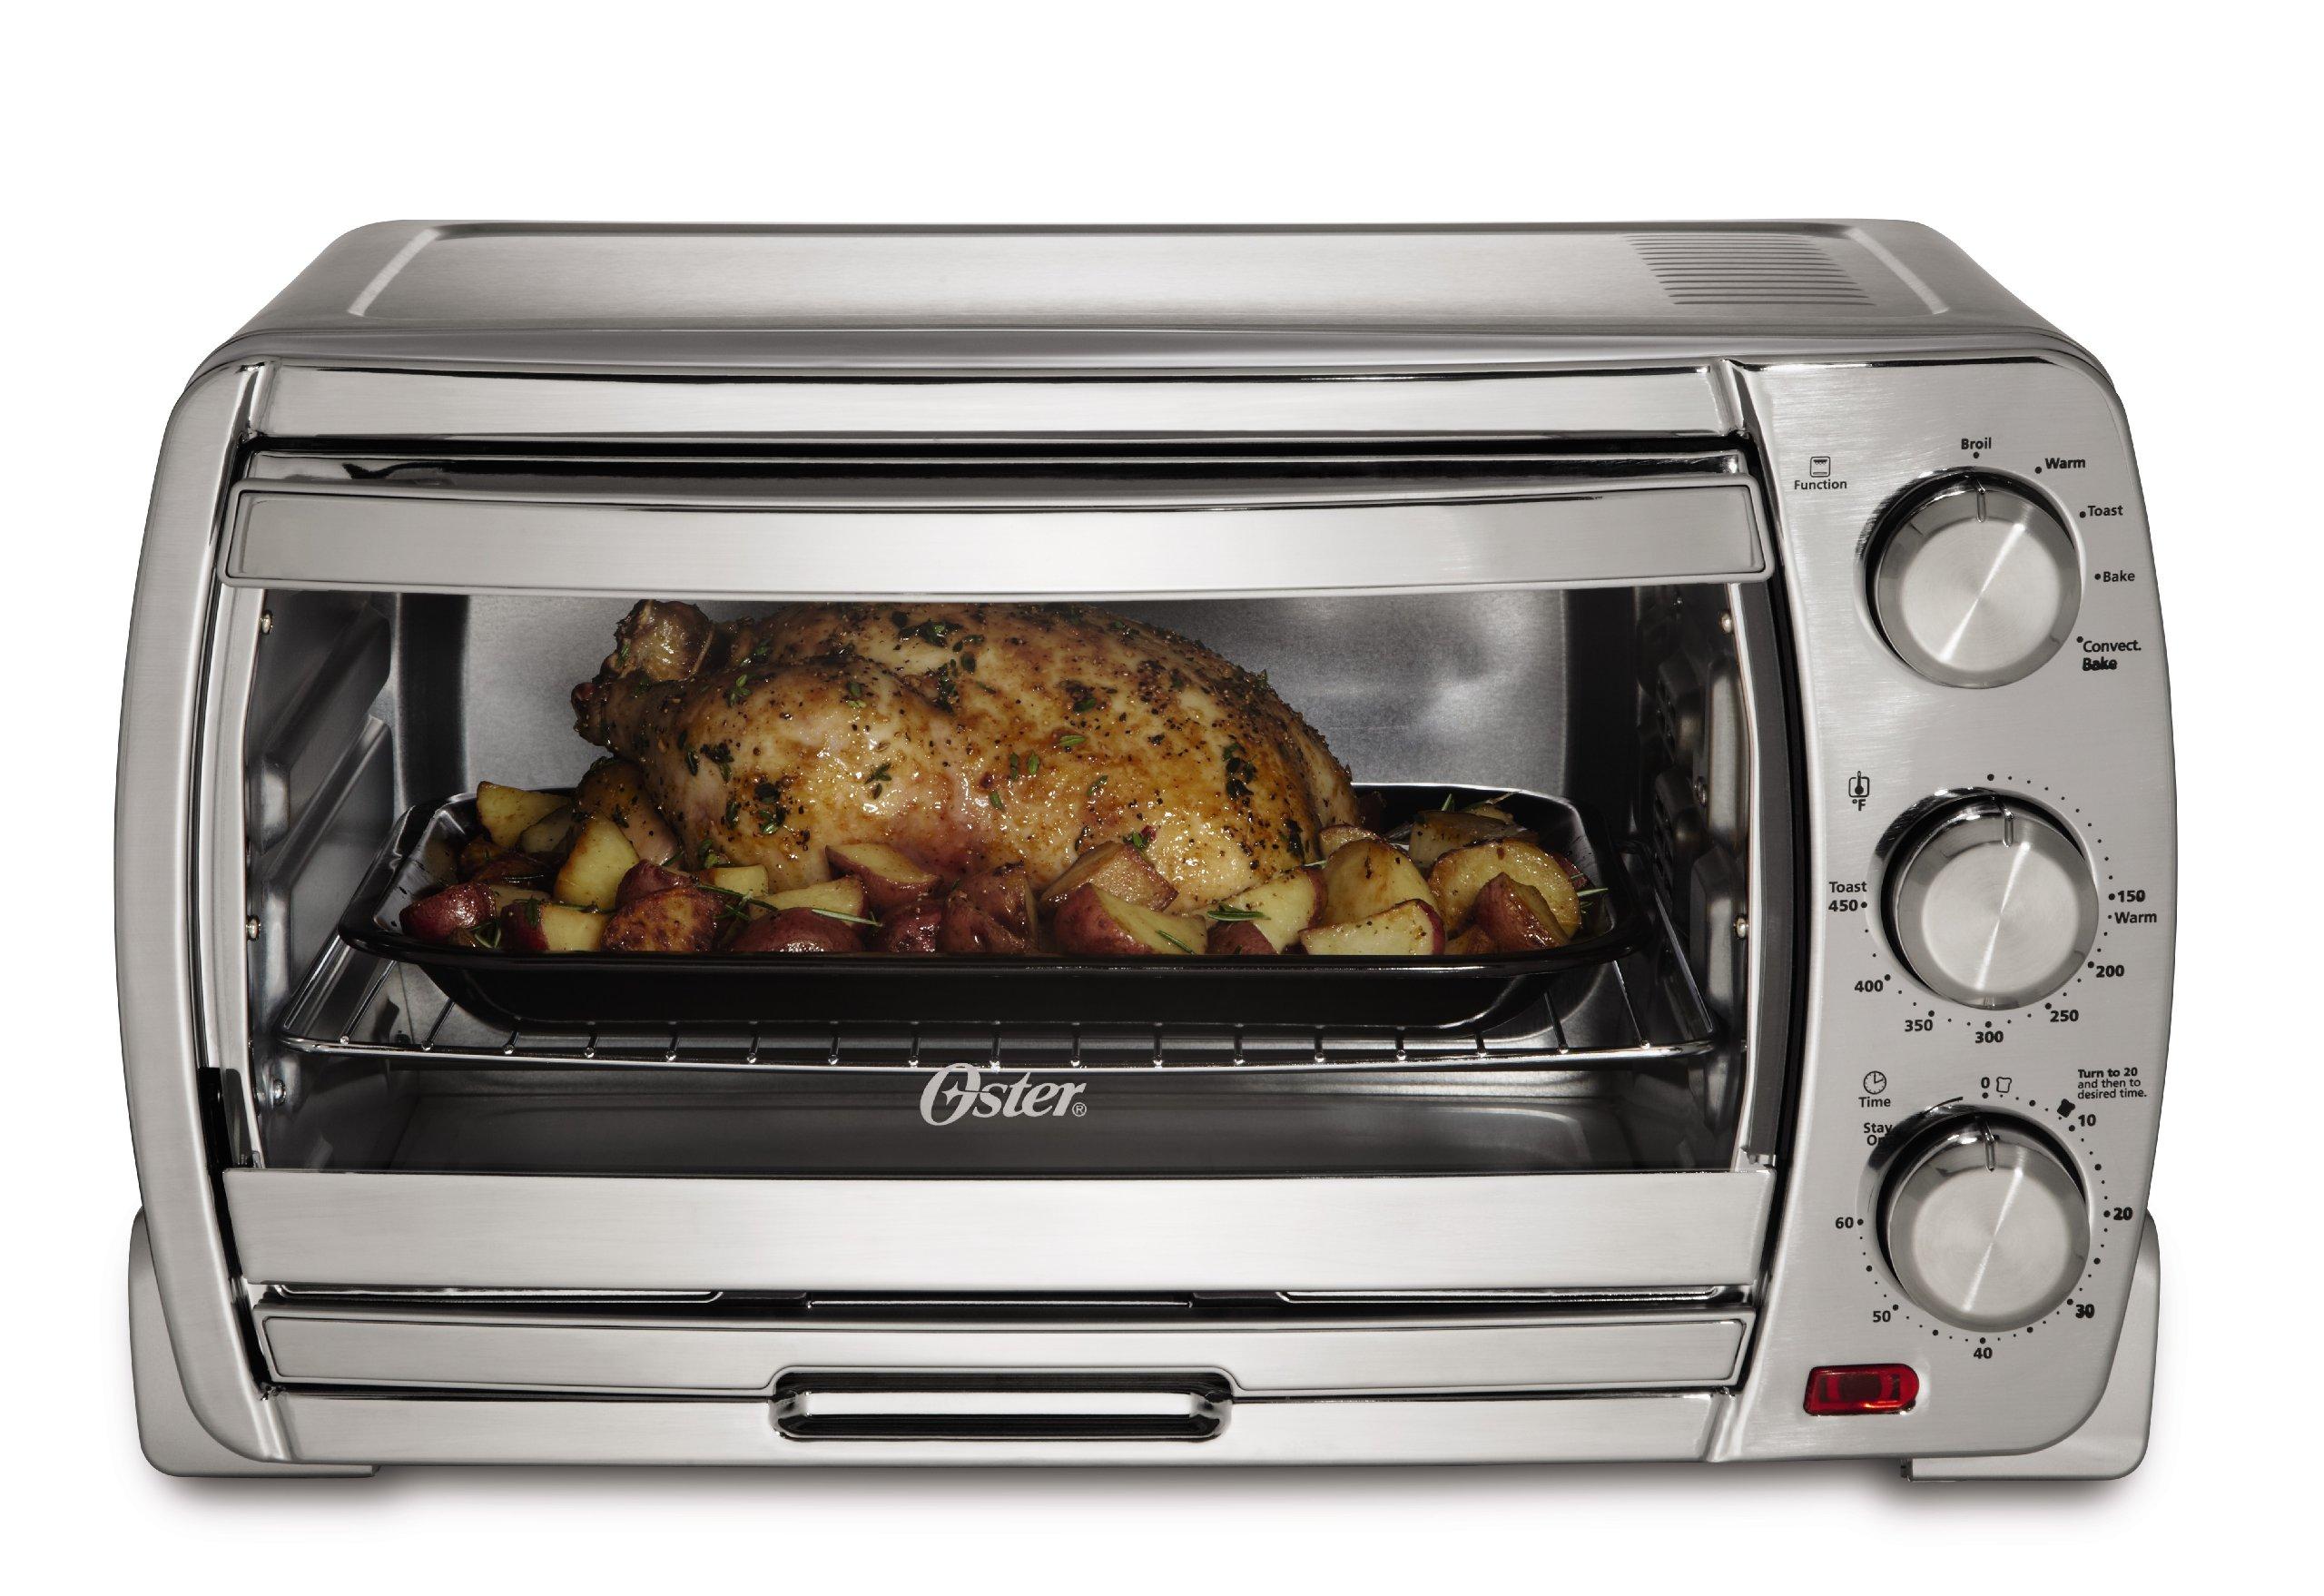 Oster Large Convection Toaster Oven, Brushed Chrome (TSSTTVSK01)